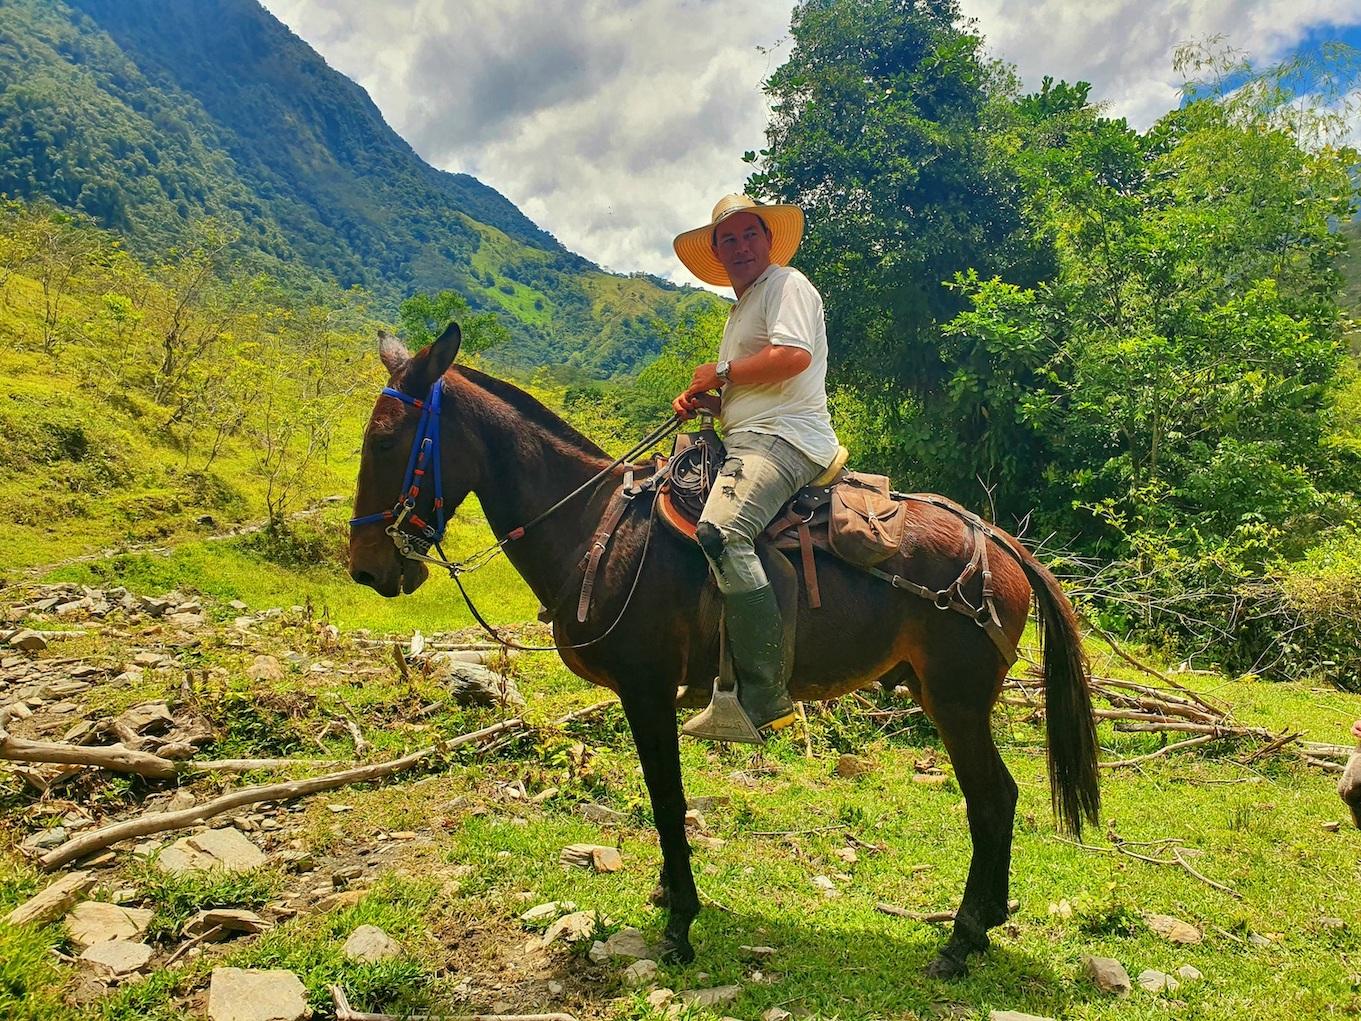 Colombia Cocorna Santo Domingo Hike Paardrijden